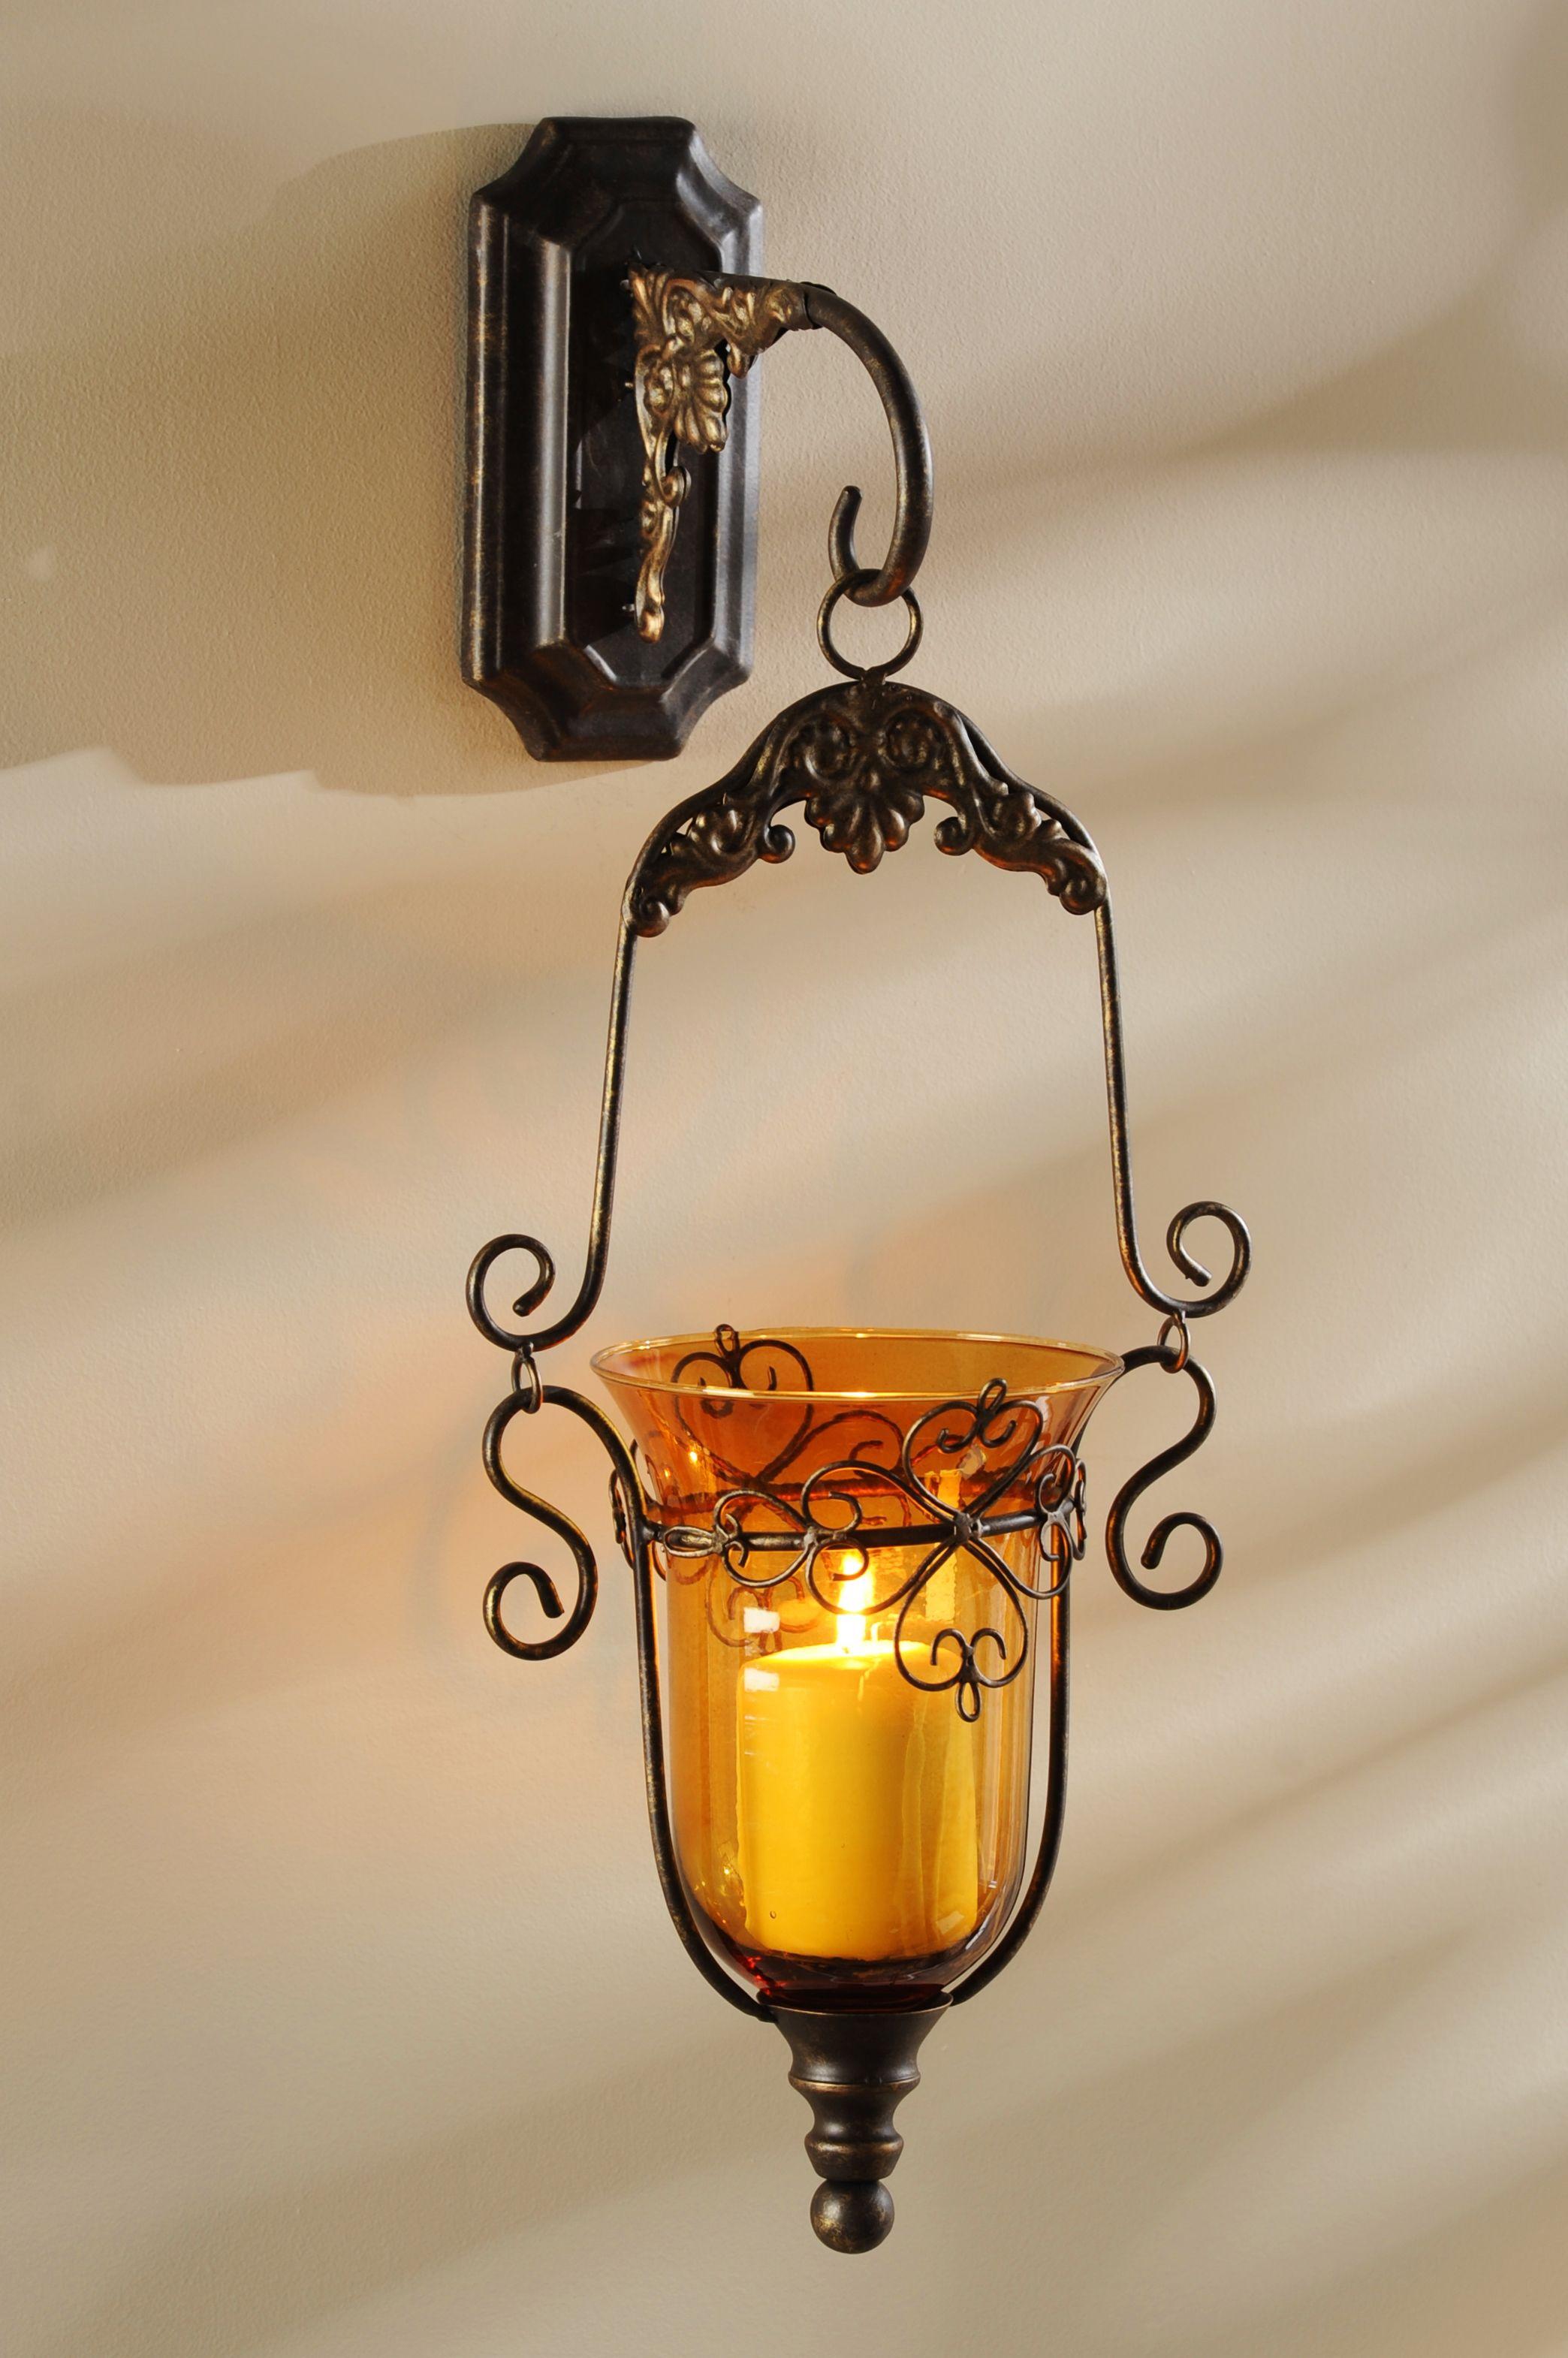 Kirkland S Candle Wall Sconces Candles Sconces